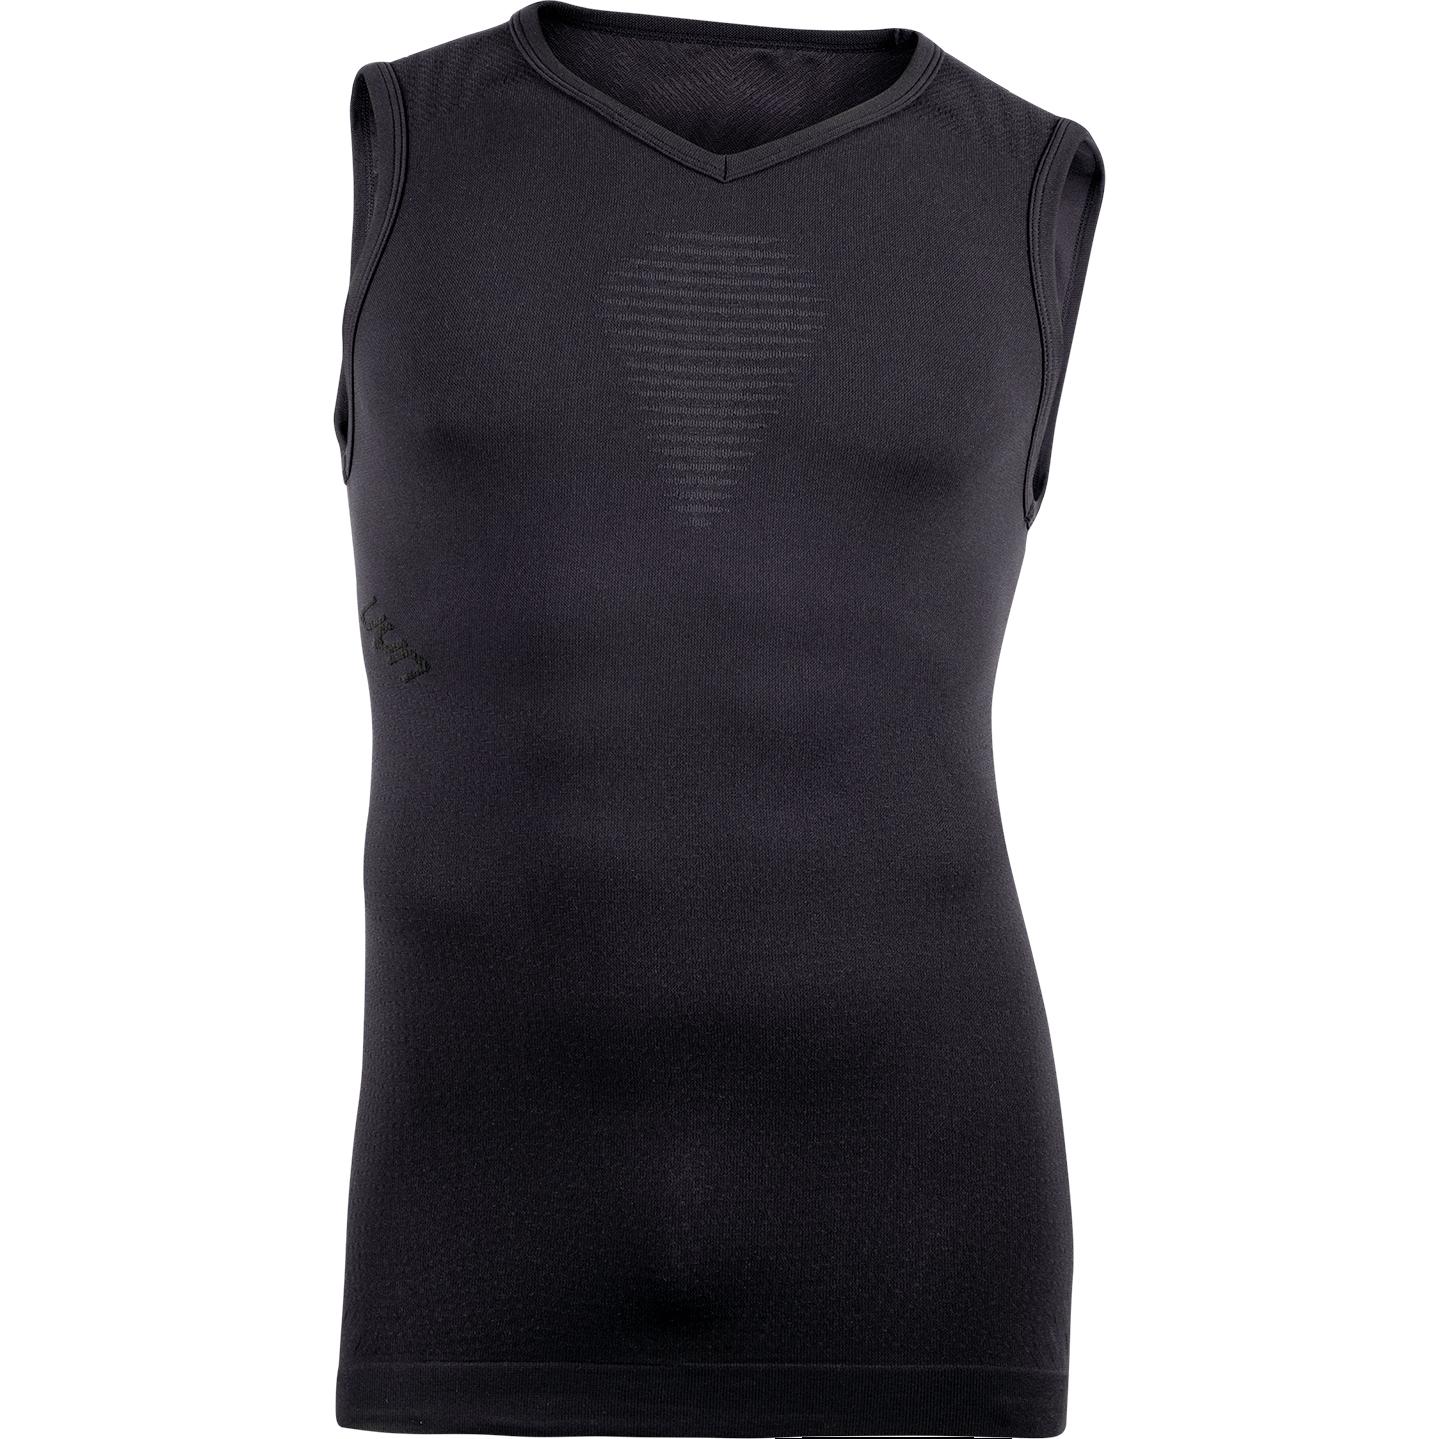 UYN Visyon Light 2.0 Herren Ärmelloses Unterhemd V-Ausschnitt - Blackboard